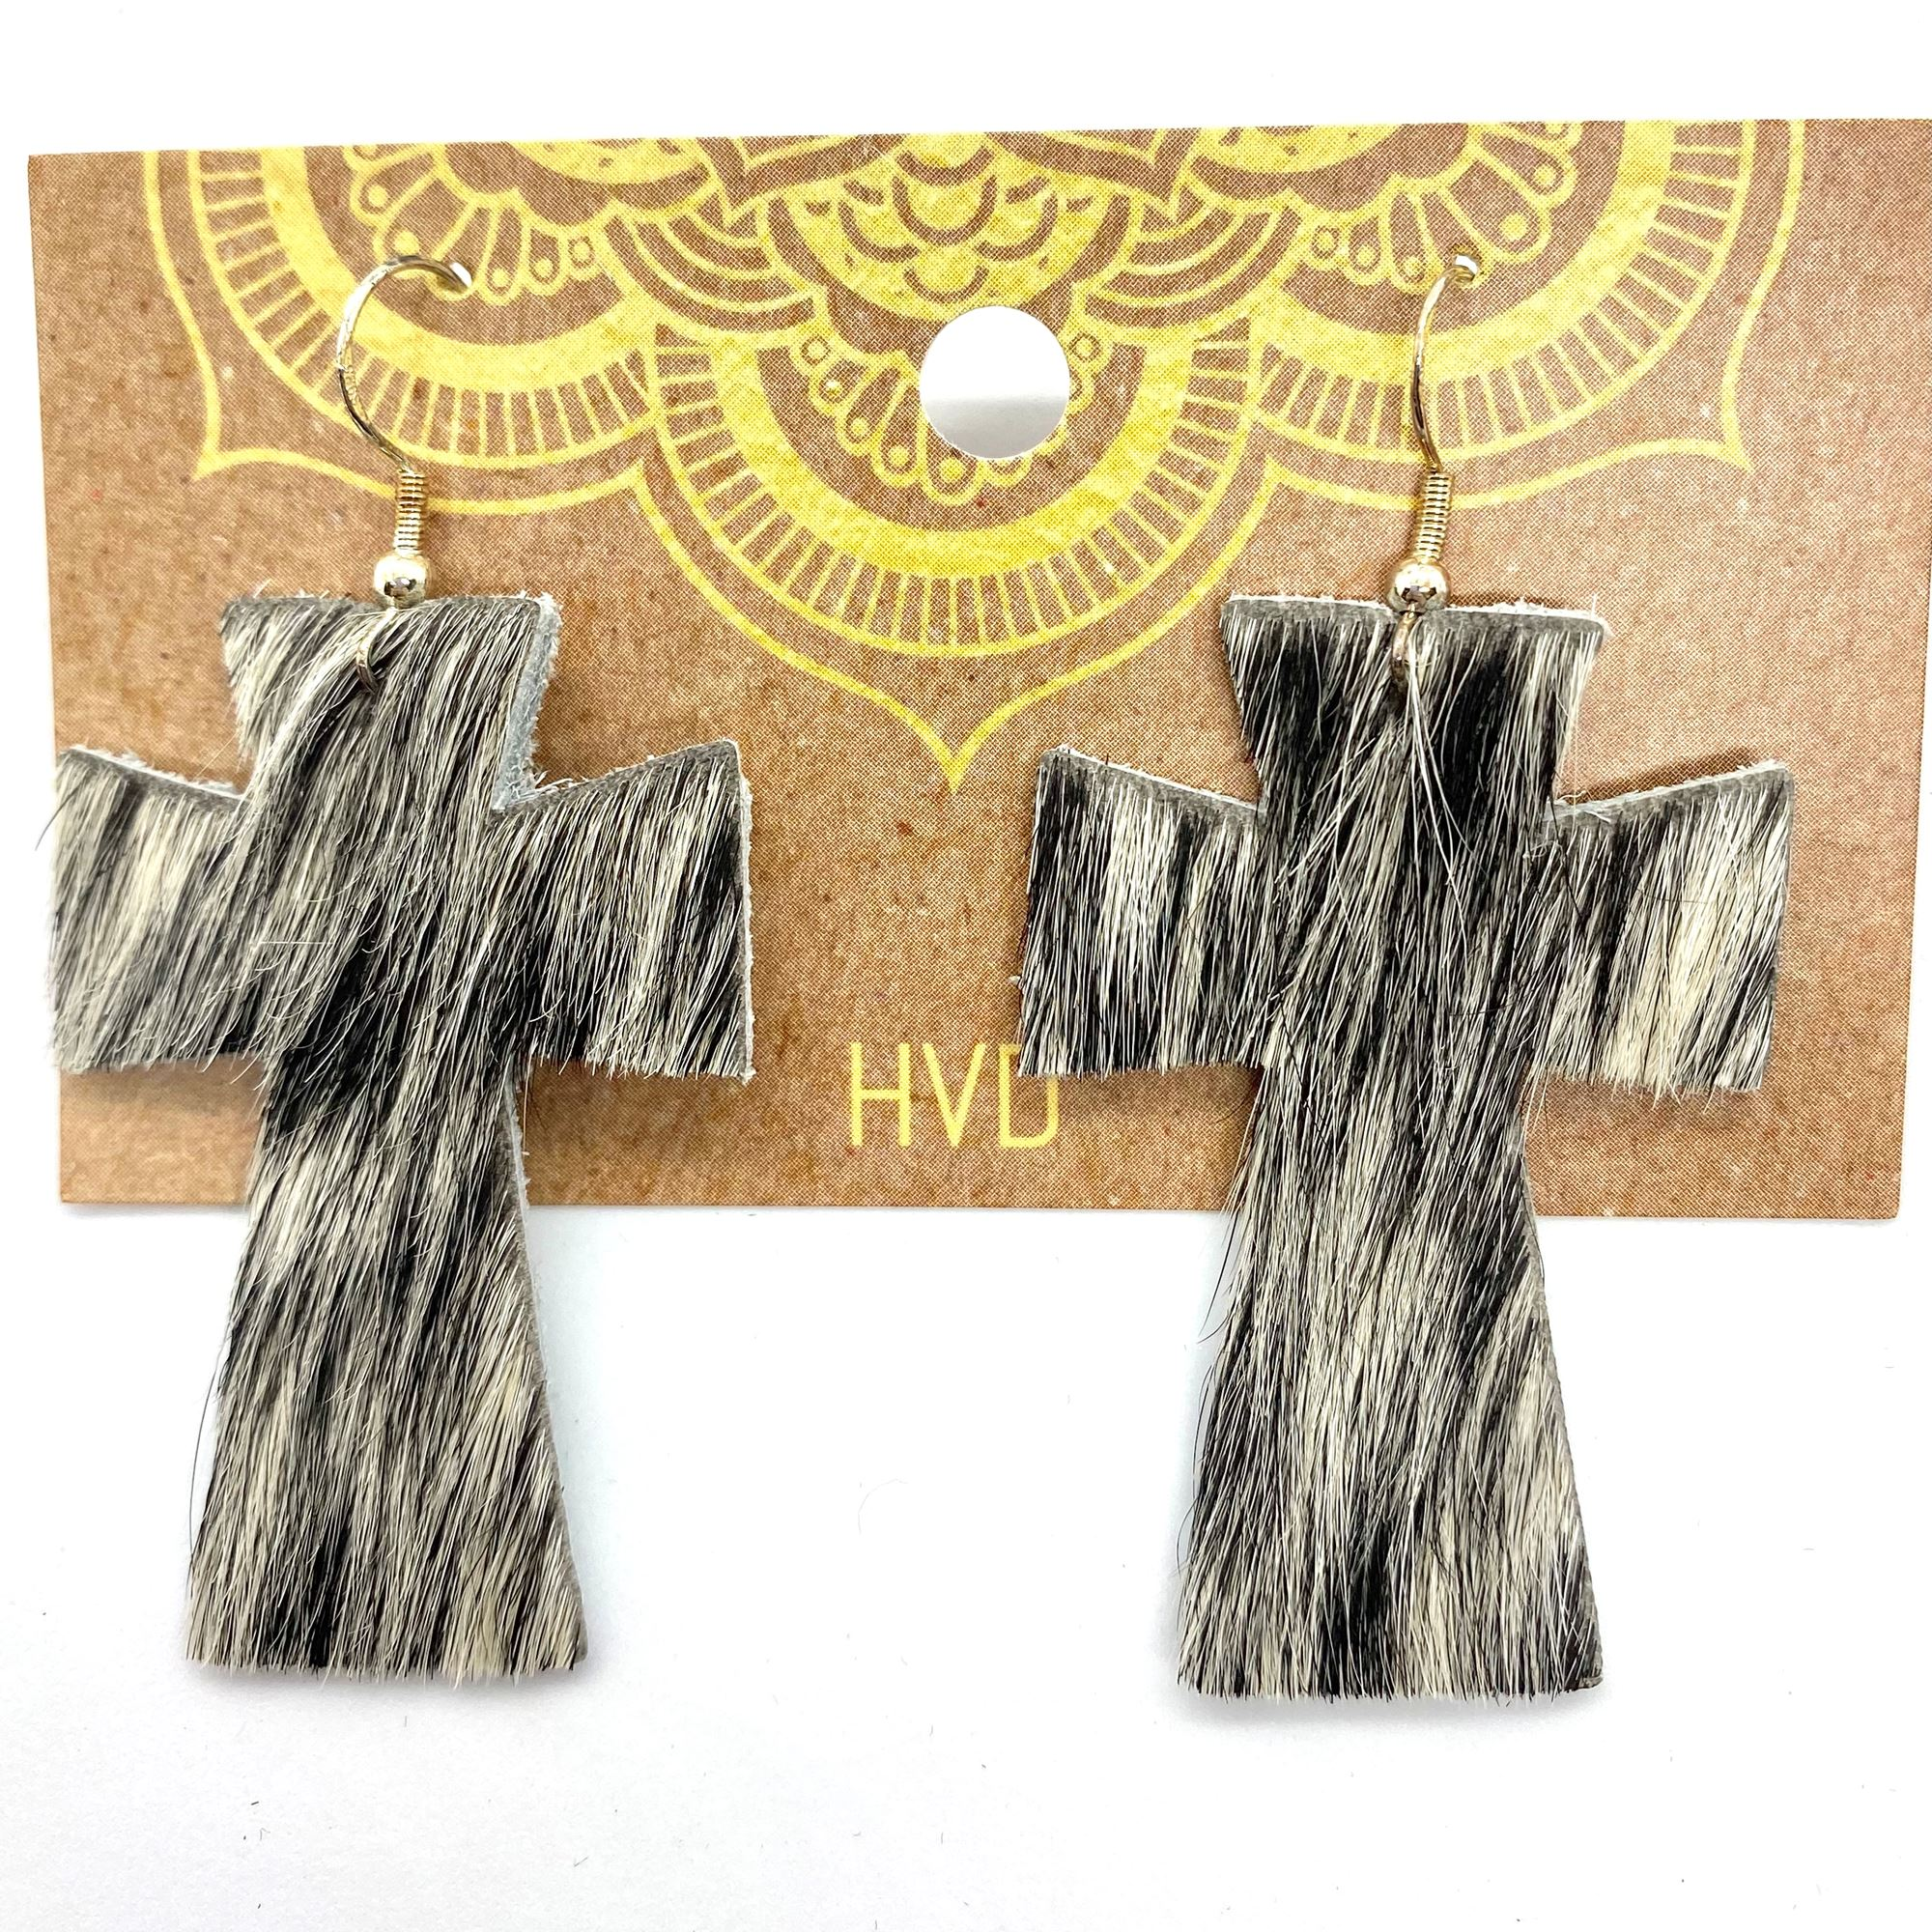 Black & White Hair-On-Hide Cross Earrings (1)